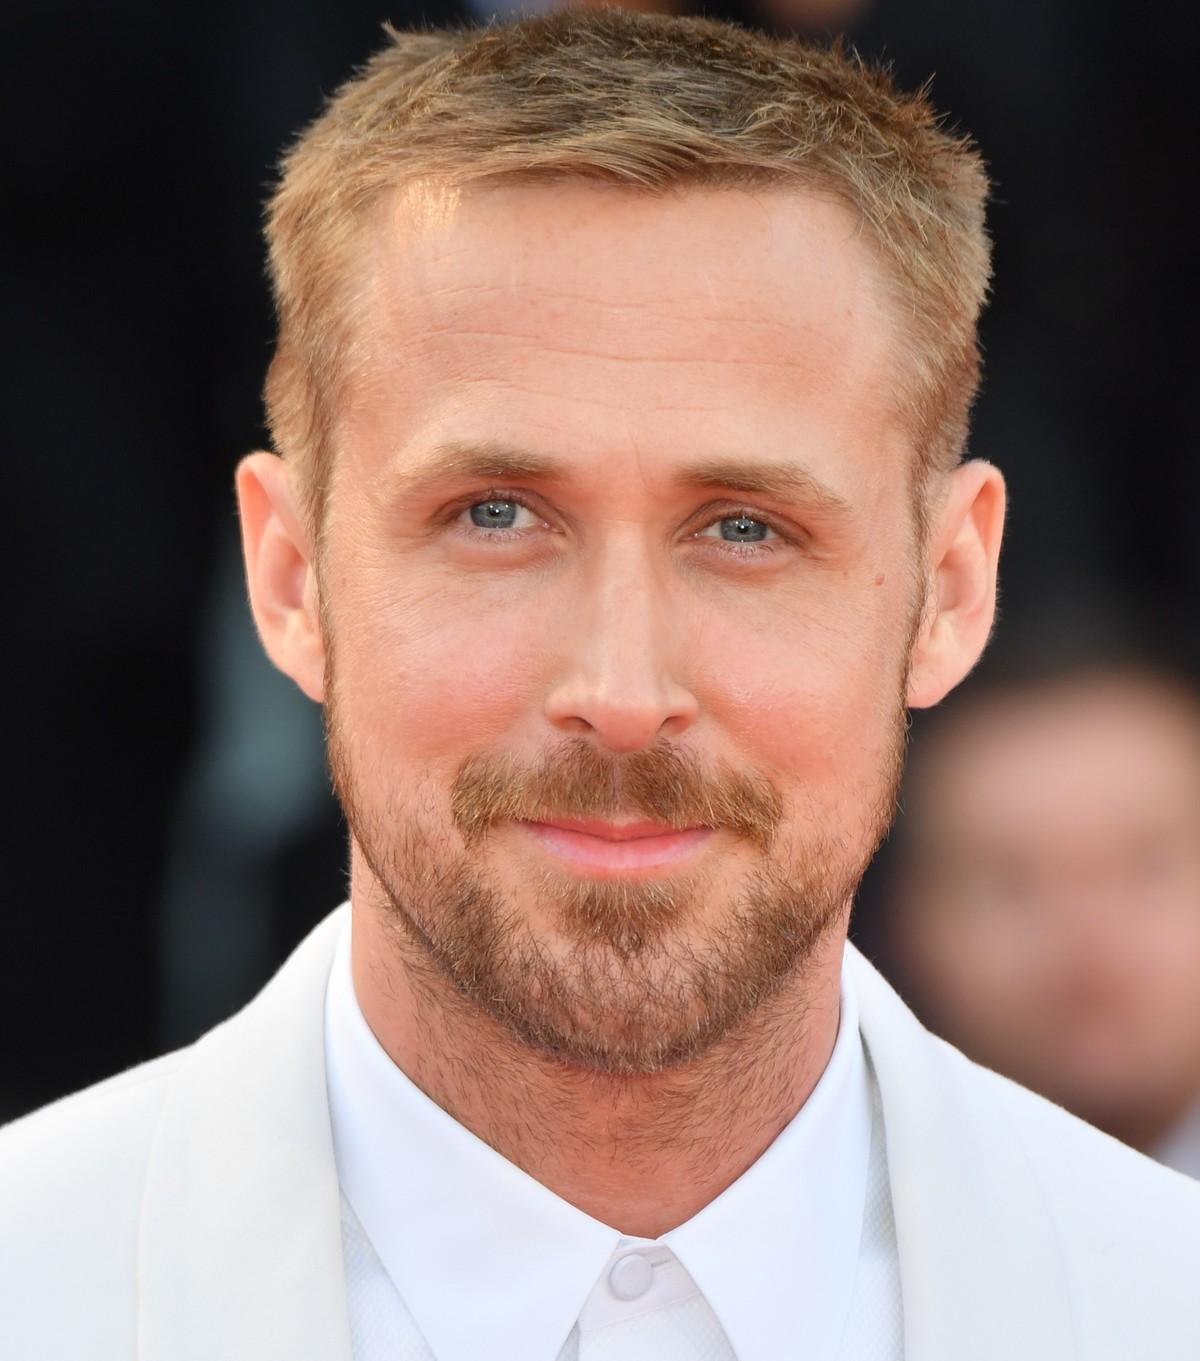 Ryan Gosling: 87.48 Percent Accuracy